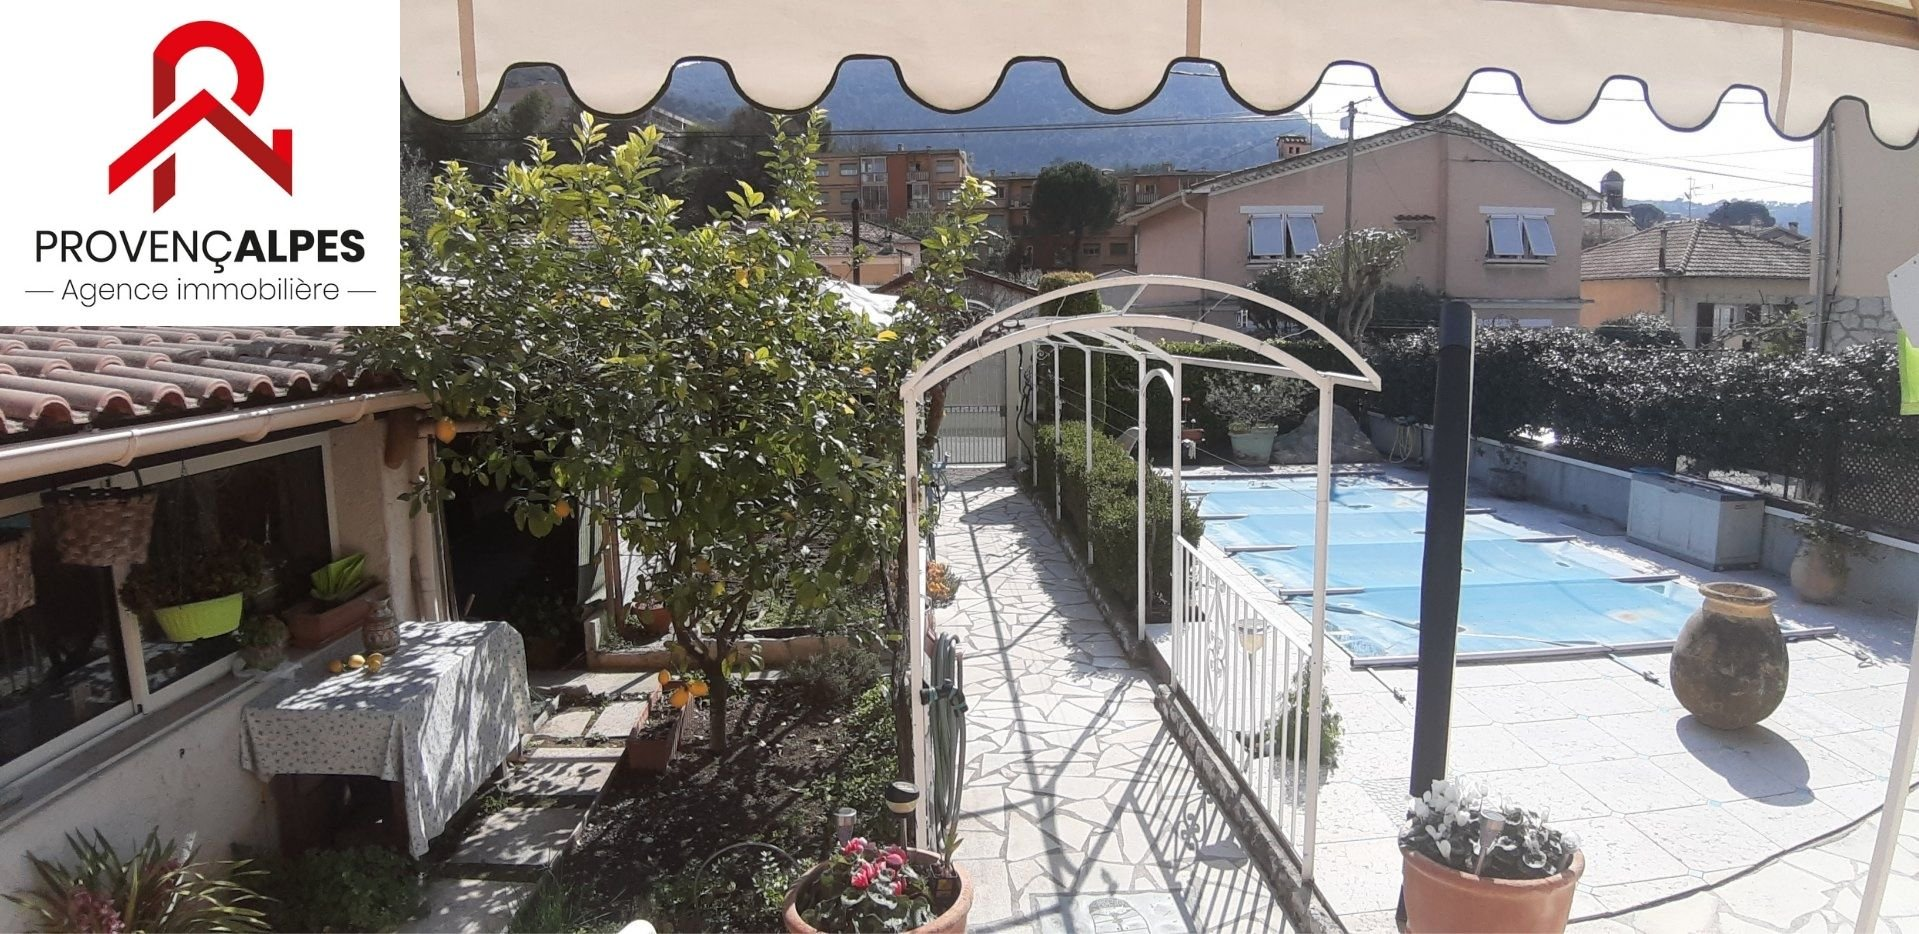 Viager : Appartement avec jardin